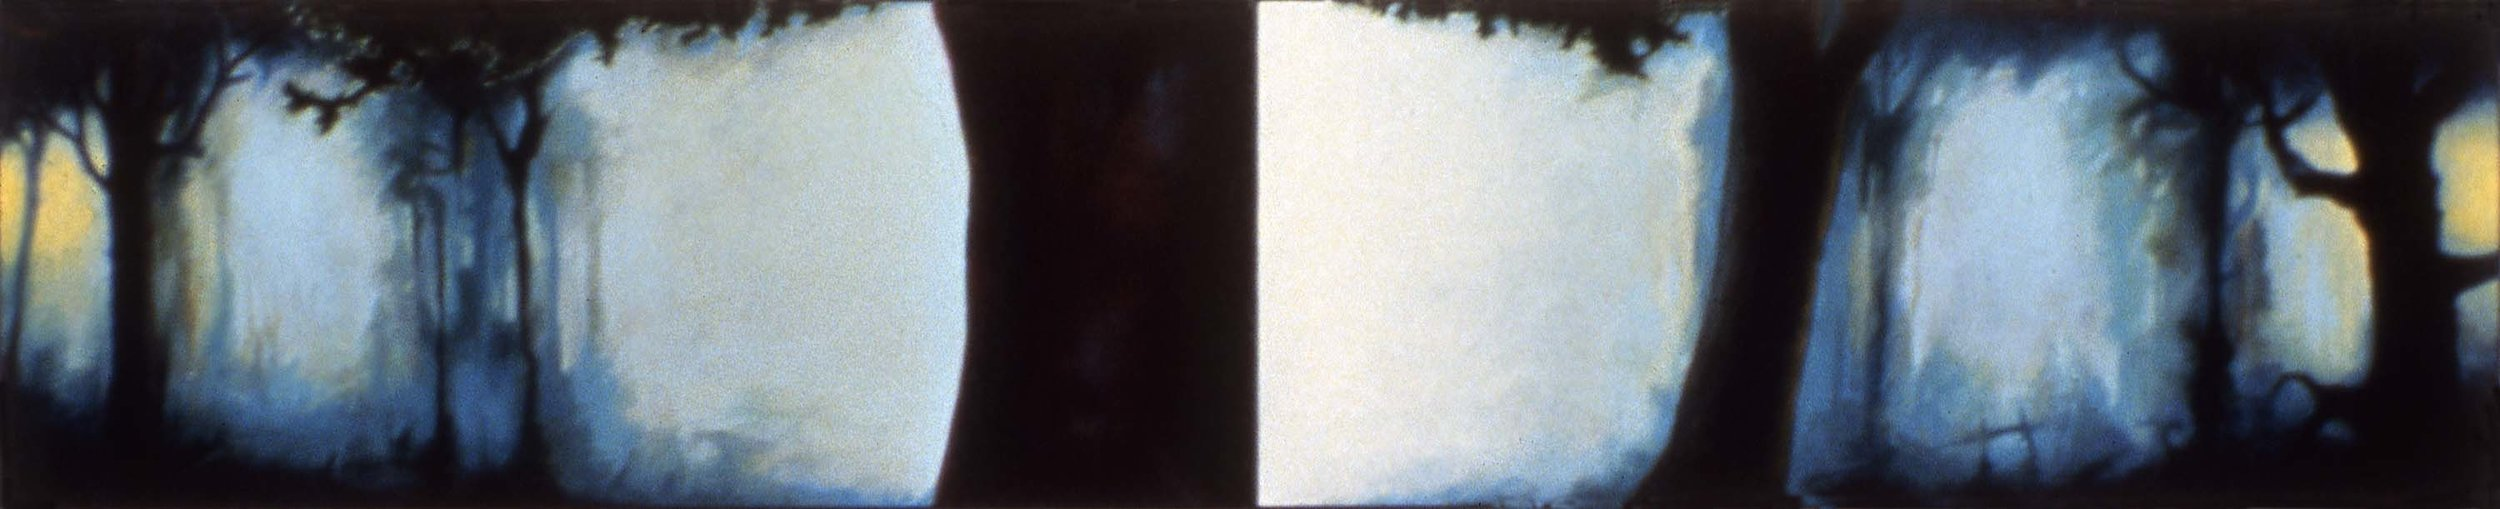 Horizon III/Grey Morning, Unattainable Desire, 1986